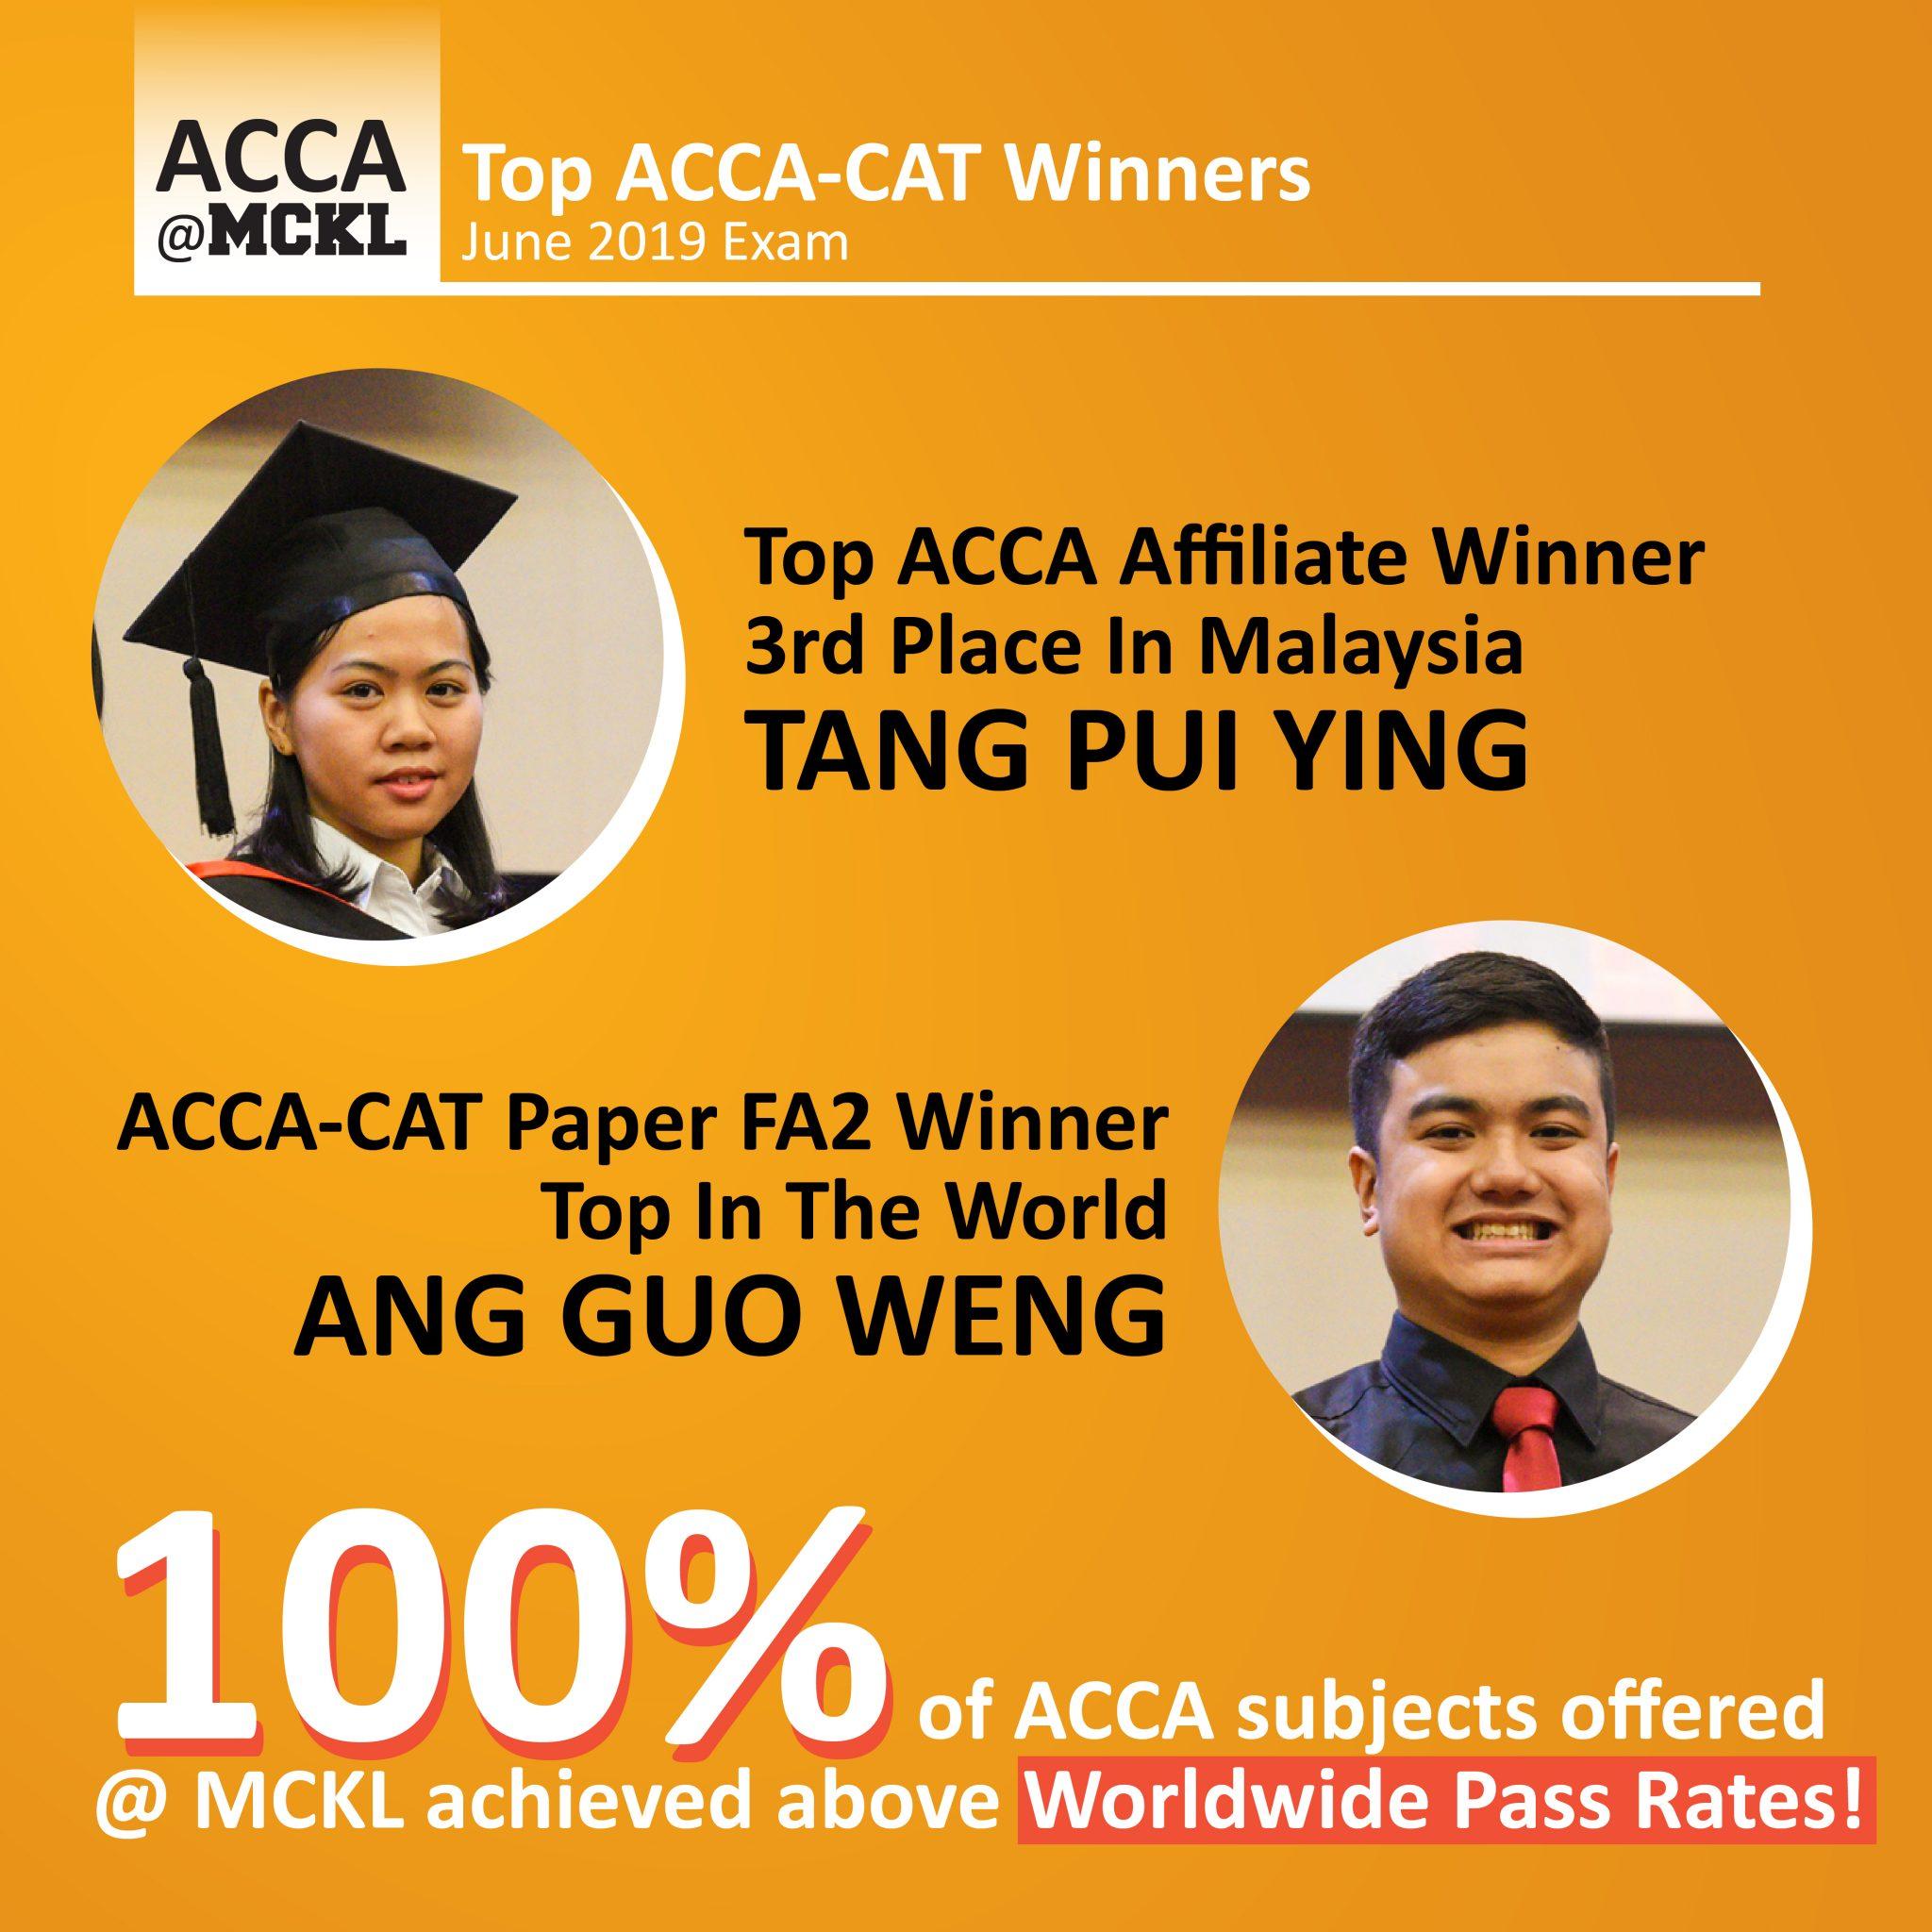 ACCA Prizewinners June 2019